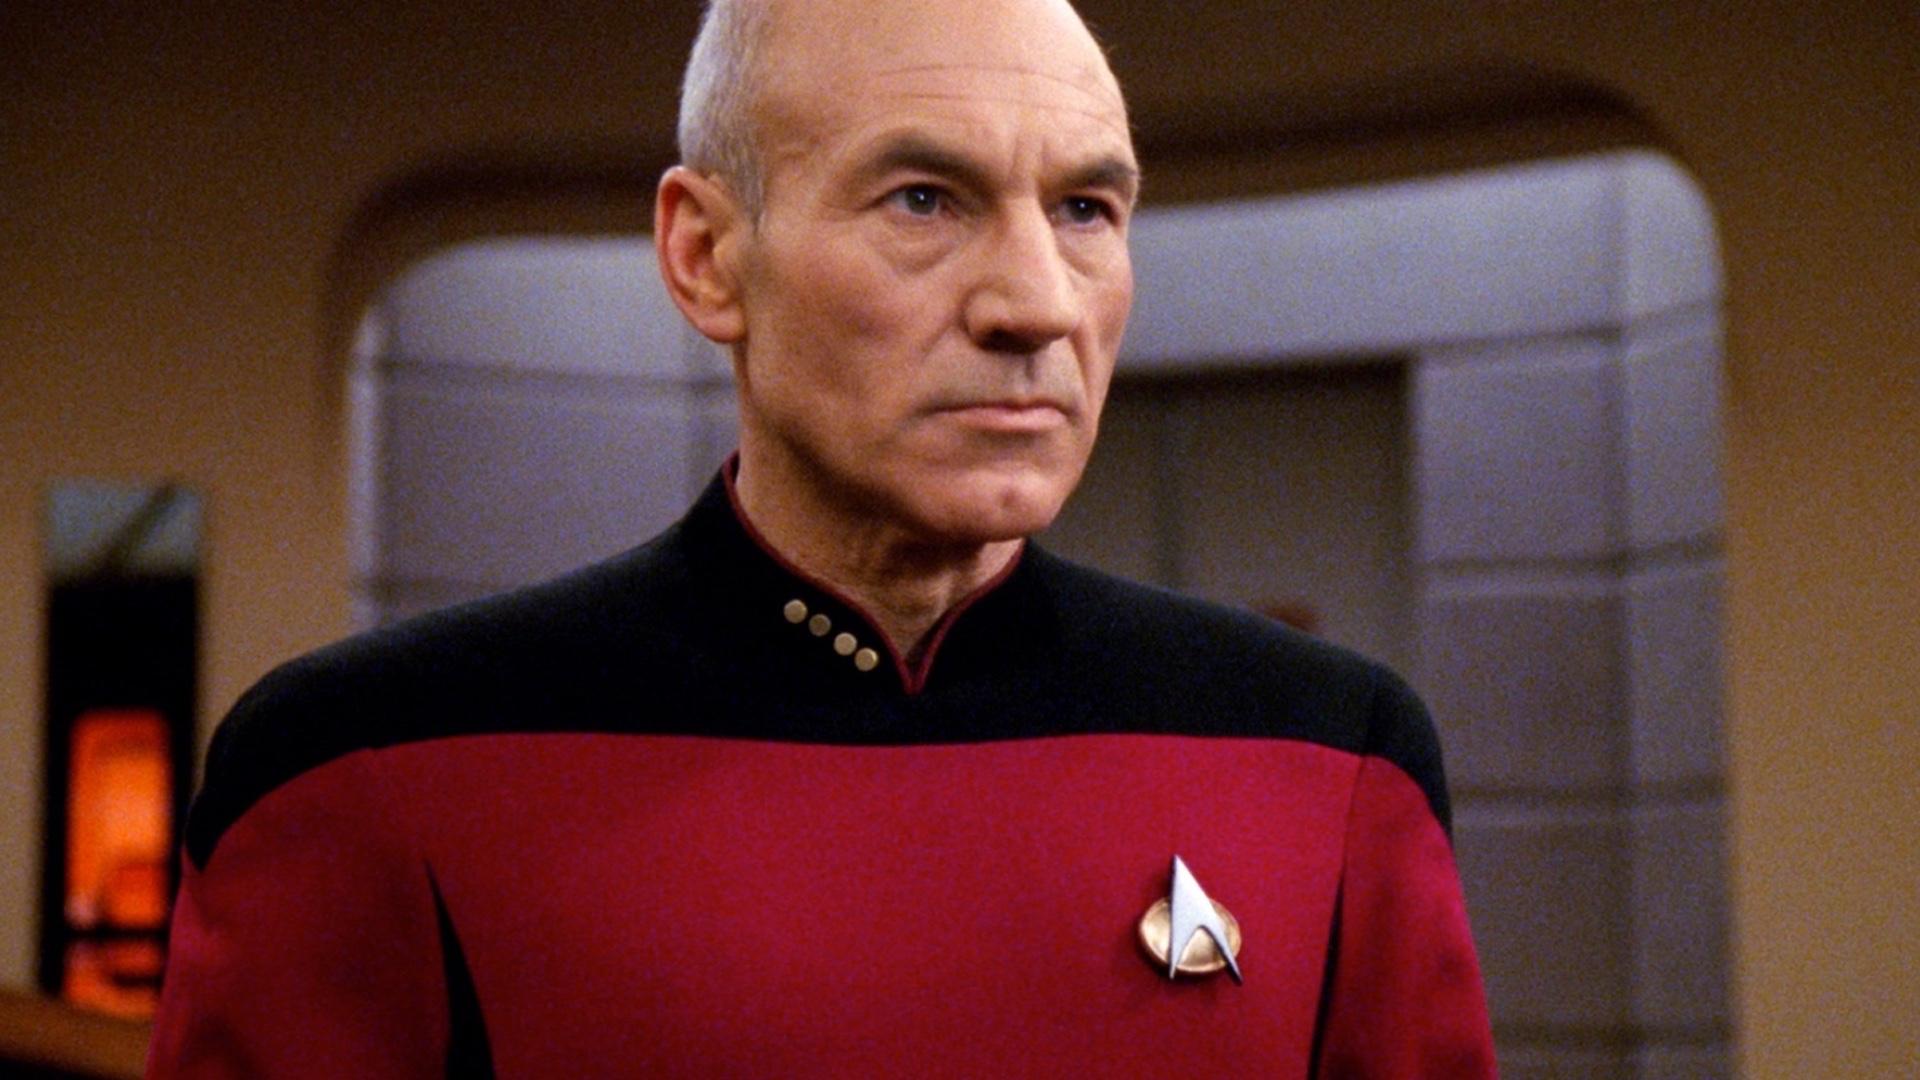 STAR TREK Featurette - What Makes Patrick Stewart's Captain Picard So Iconic?